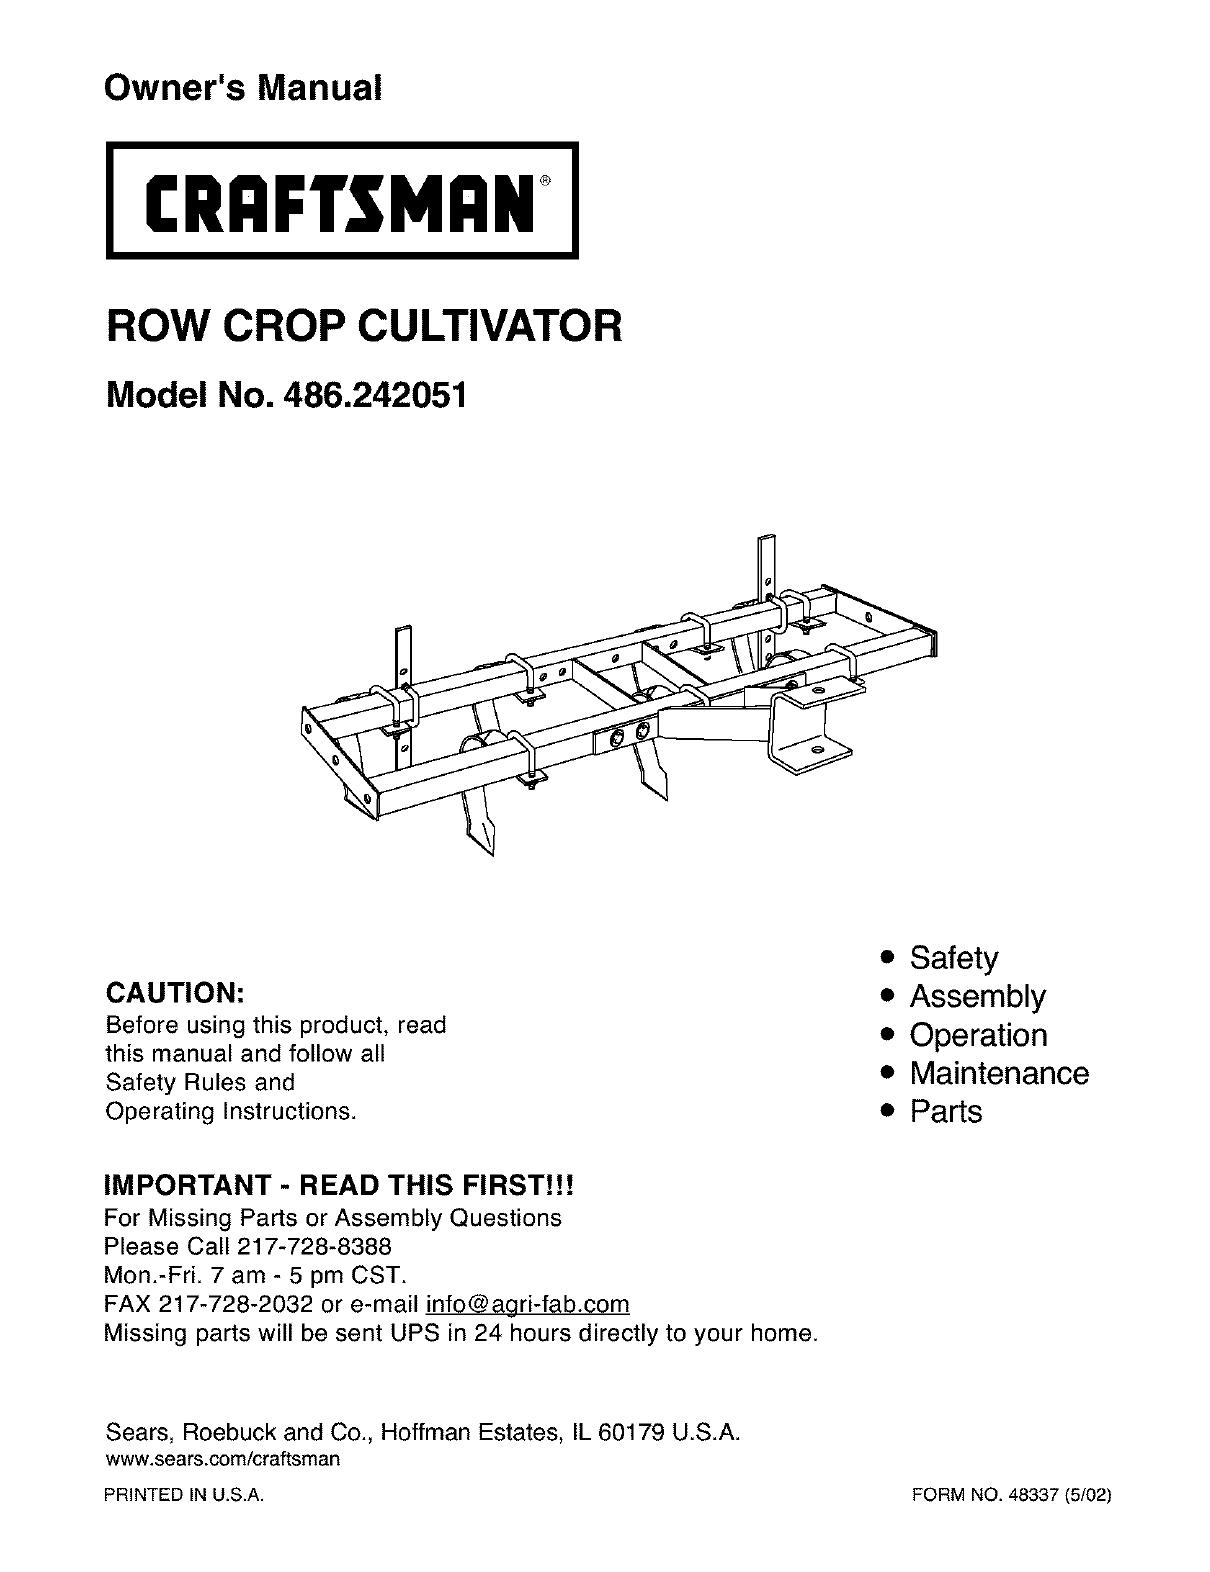 craftsman 486242051 user manual cultivator manuals and guides l0303043 rh usermanual wiki Craftsman Snowblower Manual Craftsman Lawn Tractor Manual